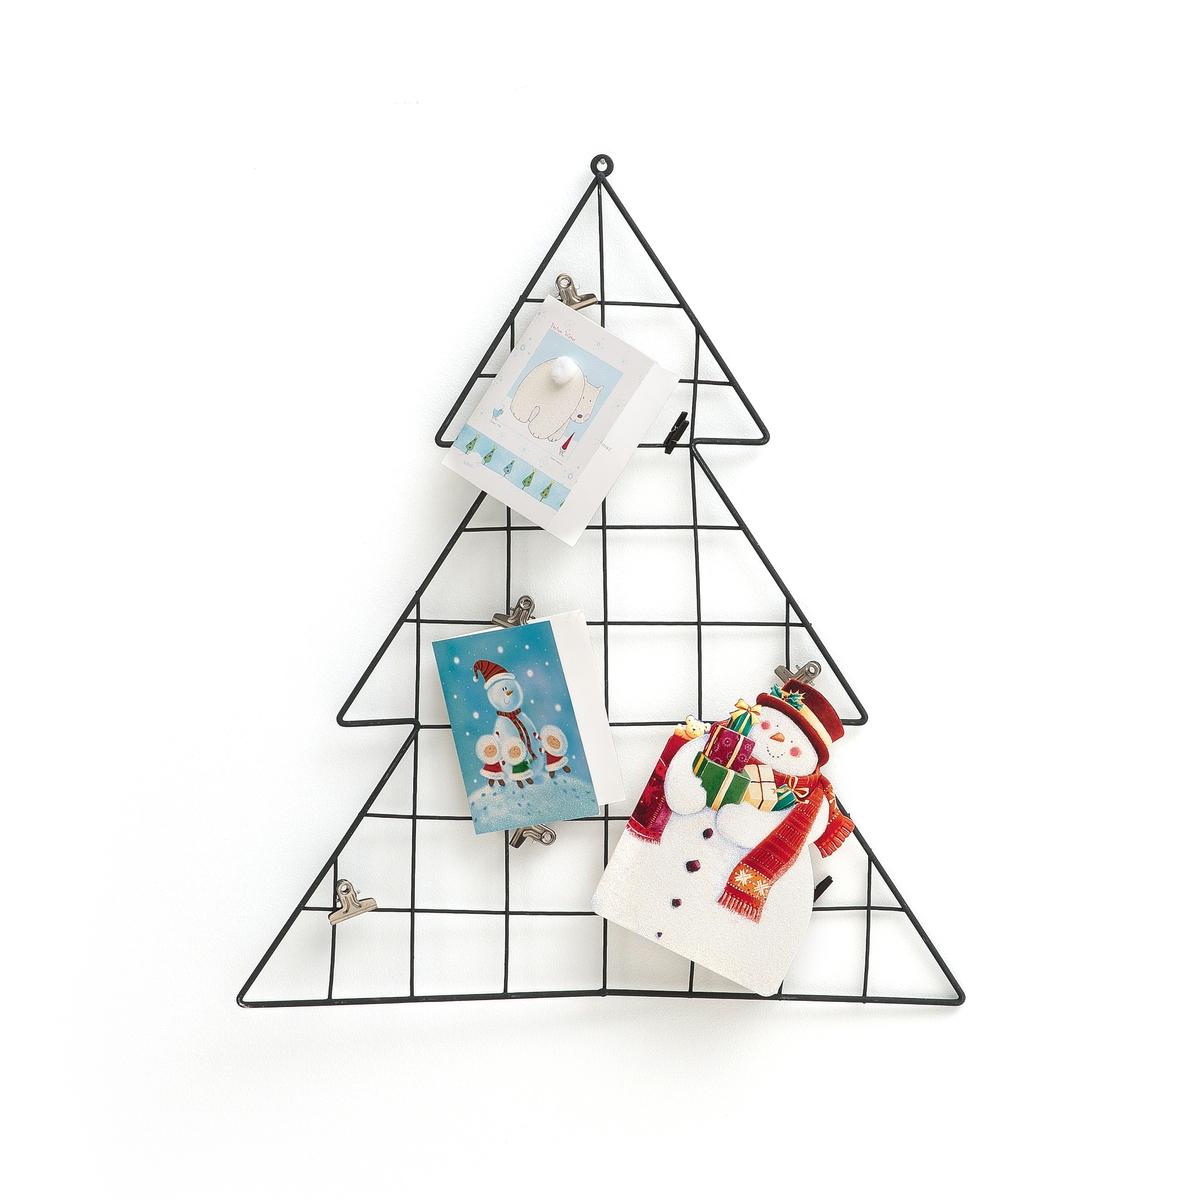 Рамка в форме елки, EPINO шахова м даркова ю новогодние елки и игрушки